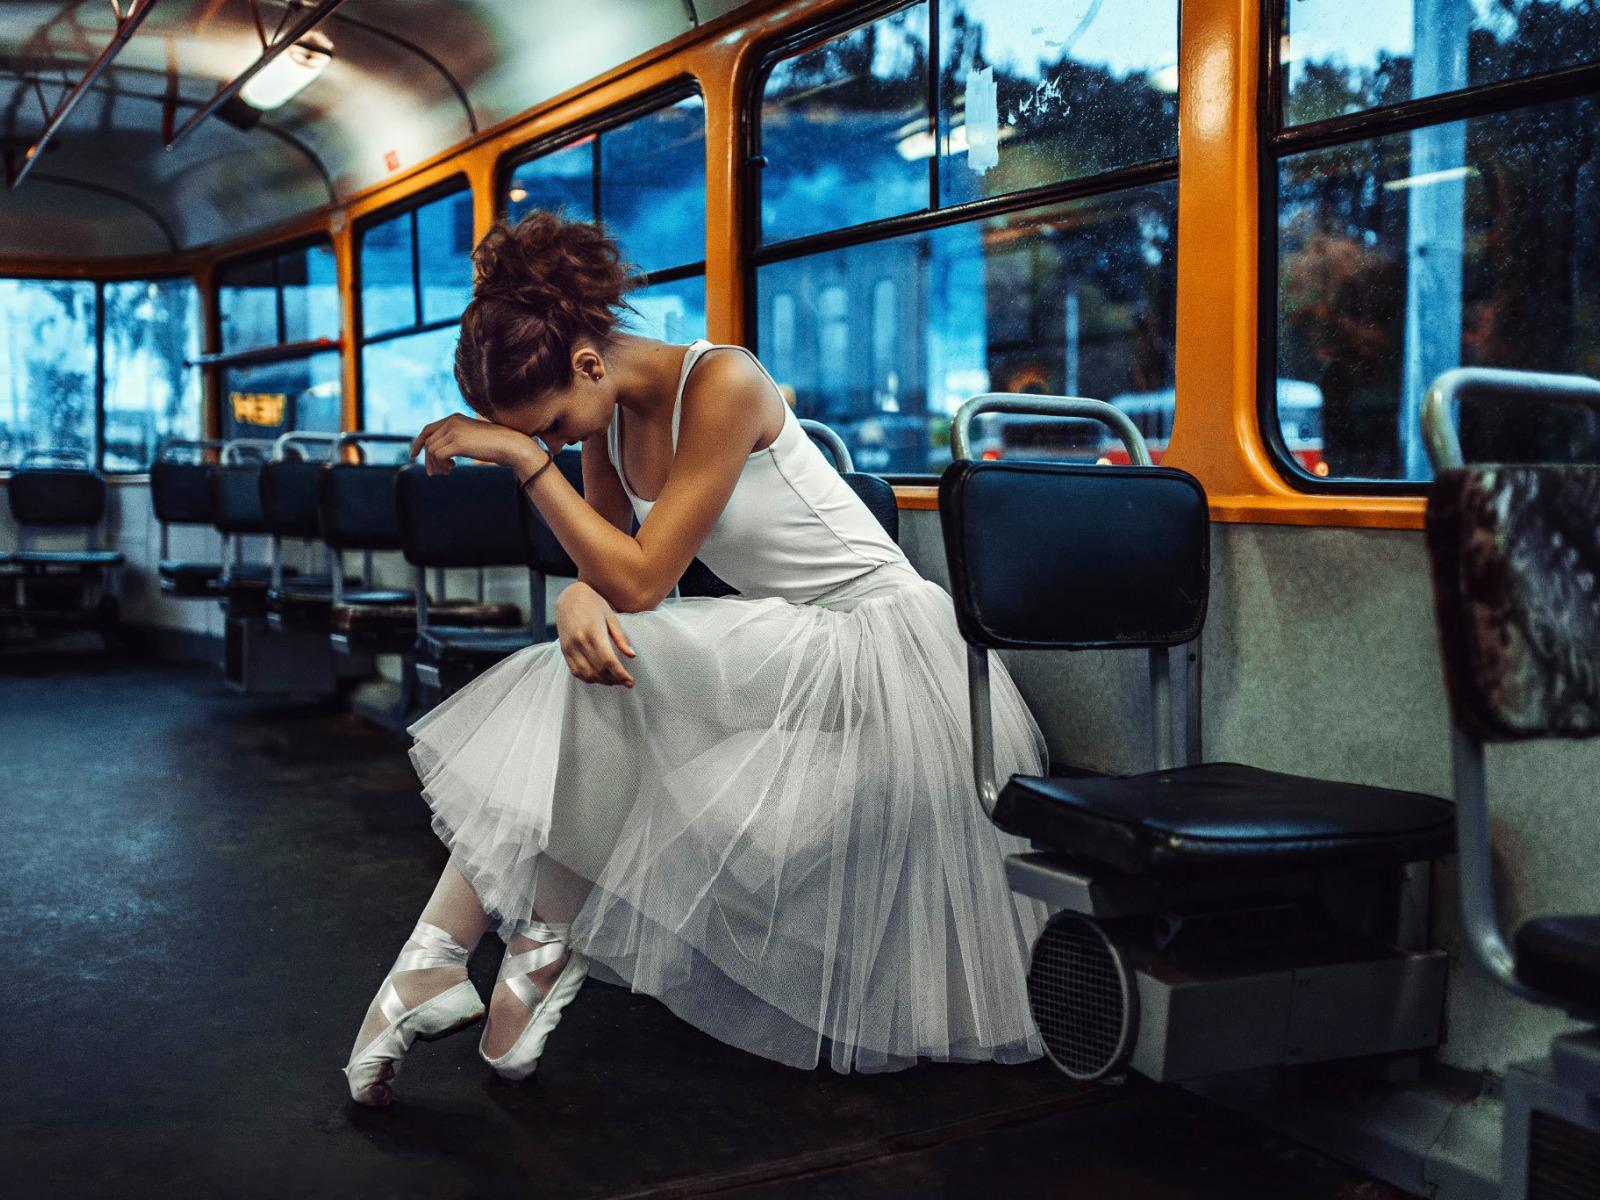 картинки еду в трамвае